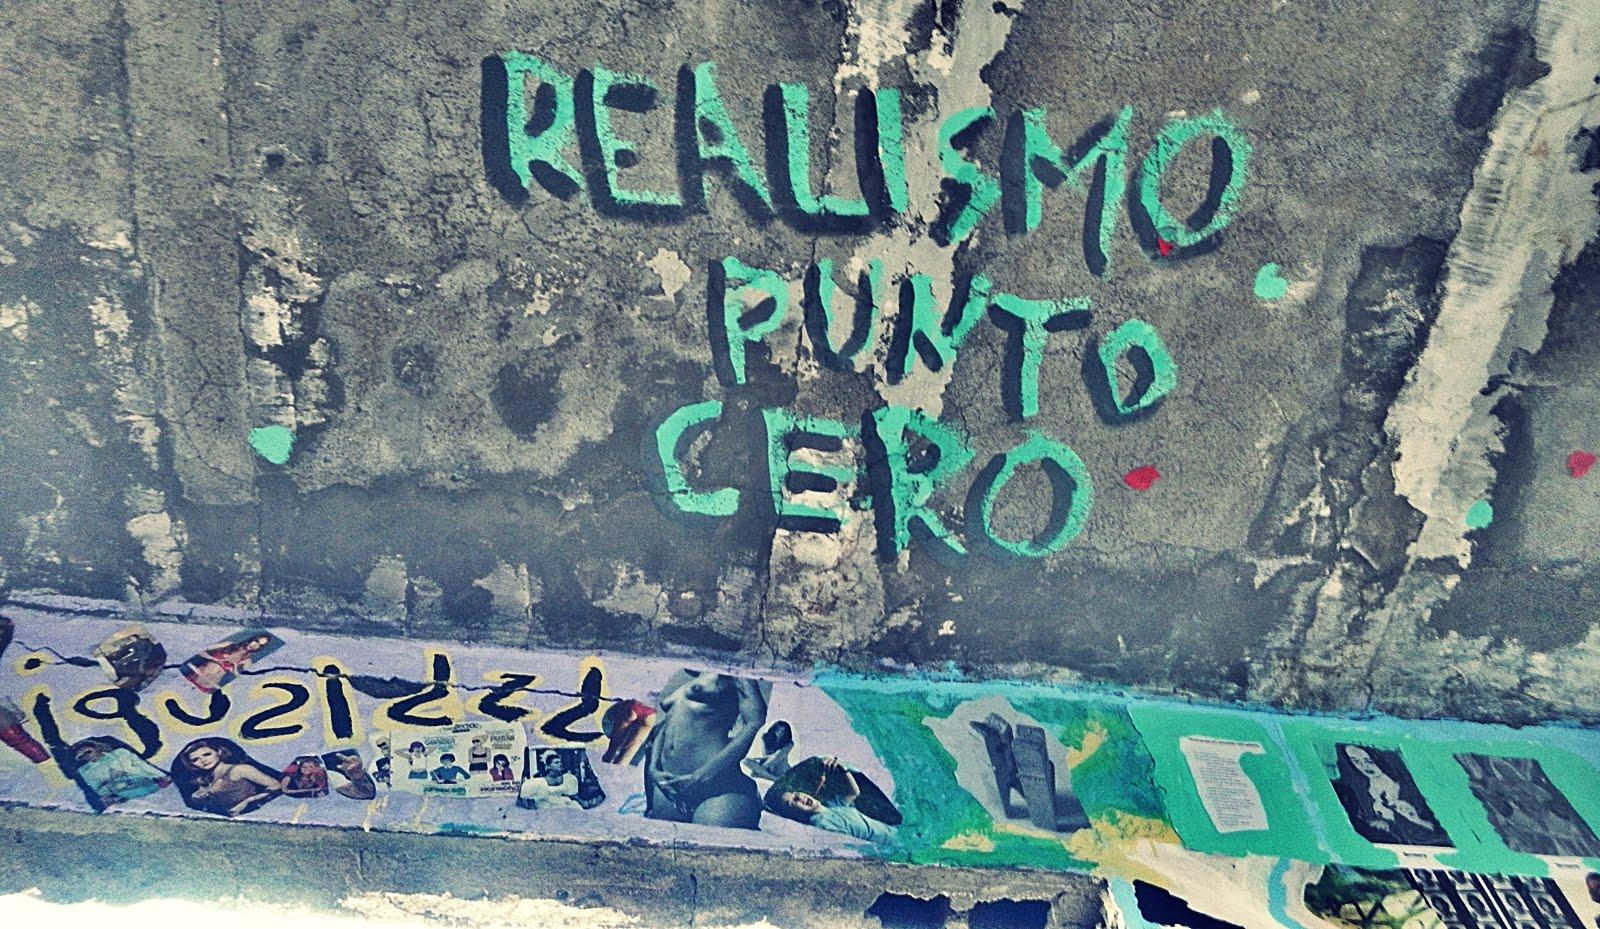 ®ealismoPuntoCero